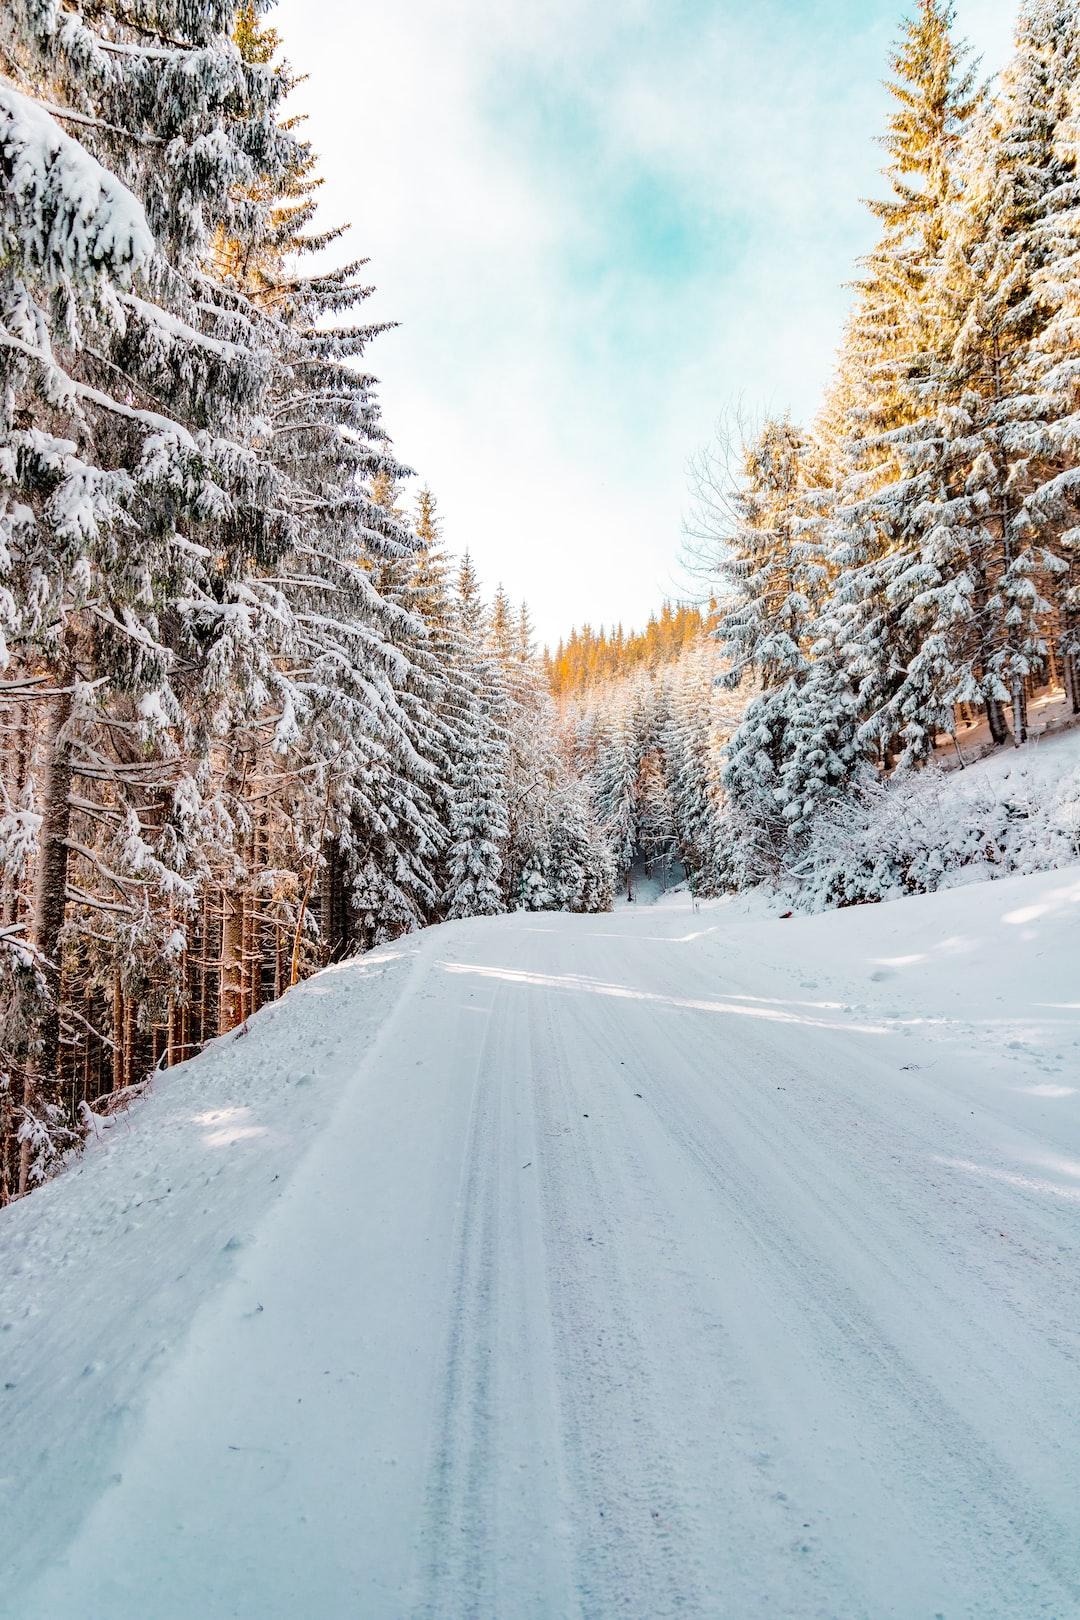 Snowy mountain street.